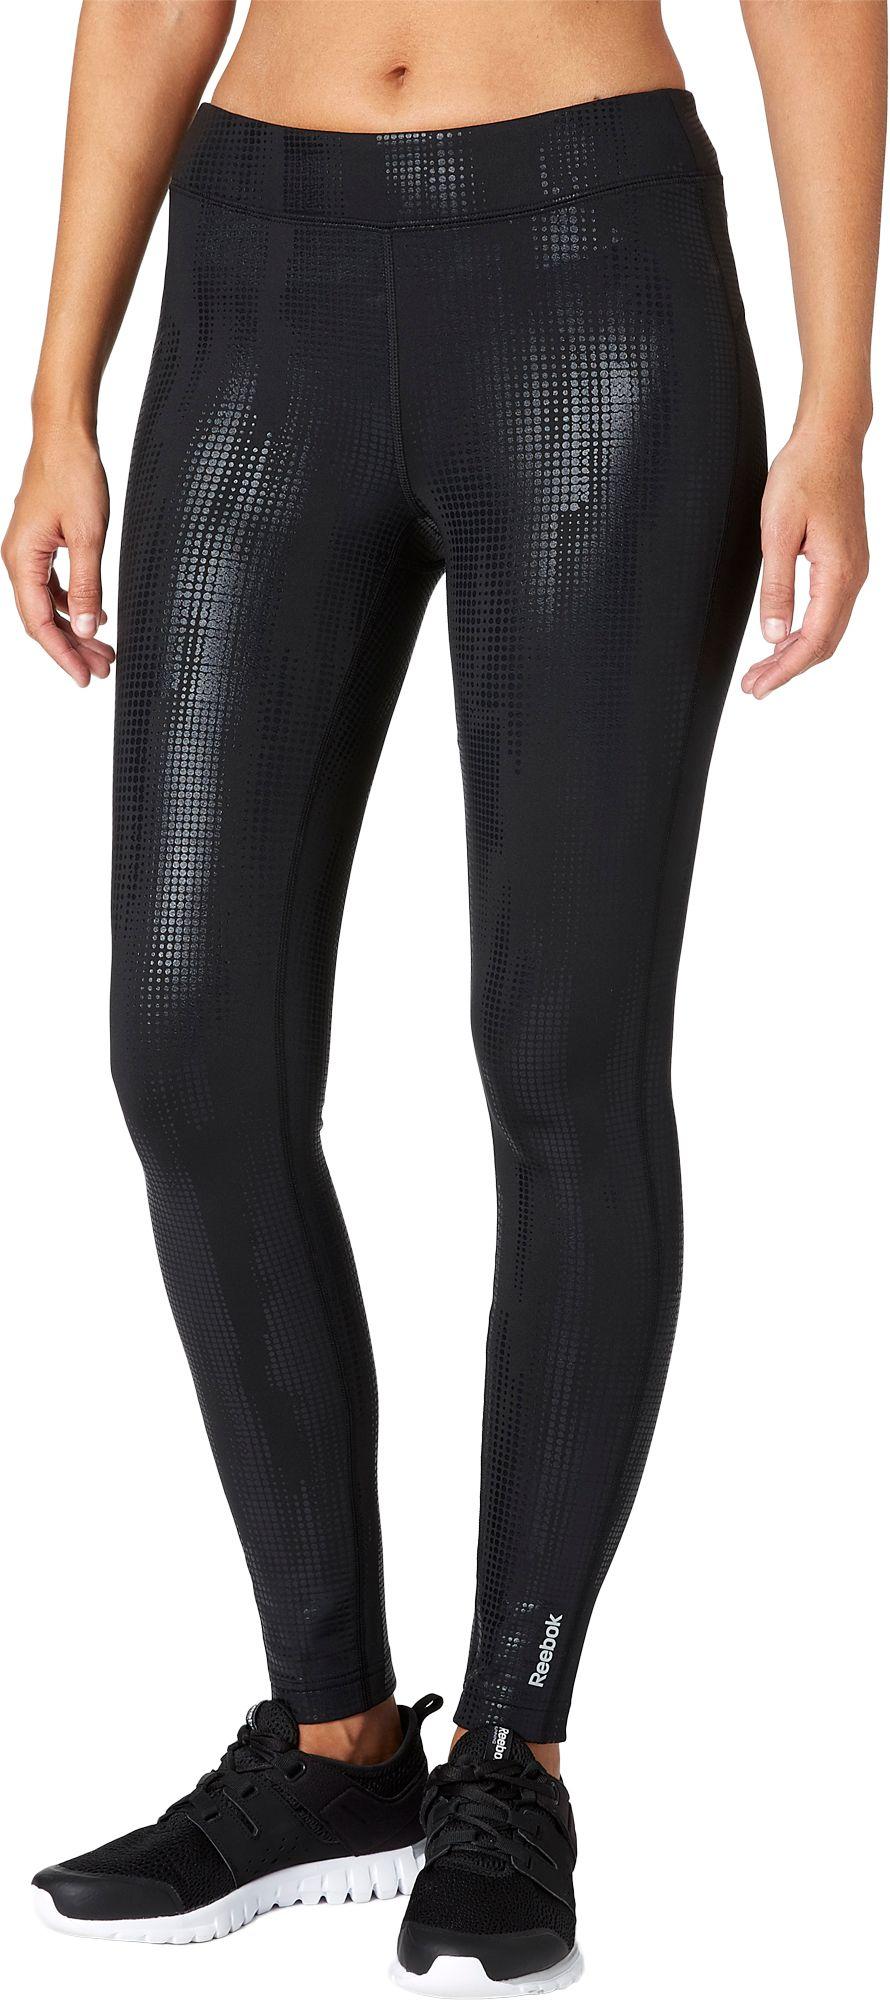 Reebok Women's Cold Compression Camo Foil Ankle Tights, Size: Medium, Black thumbnail